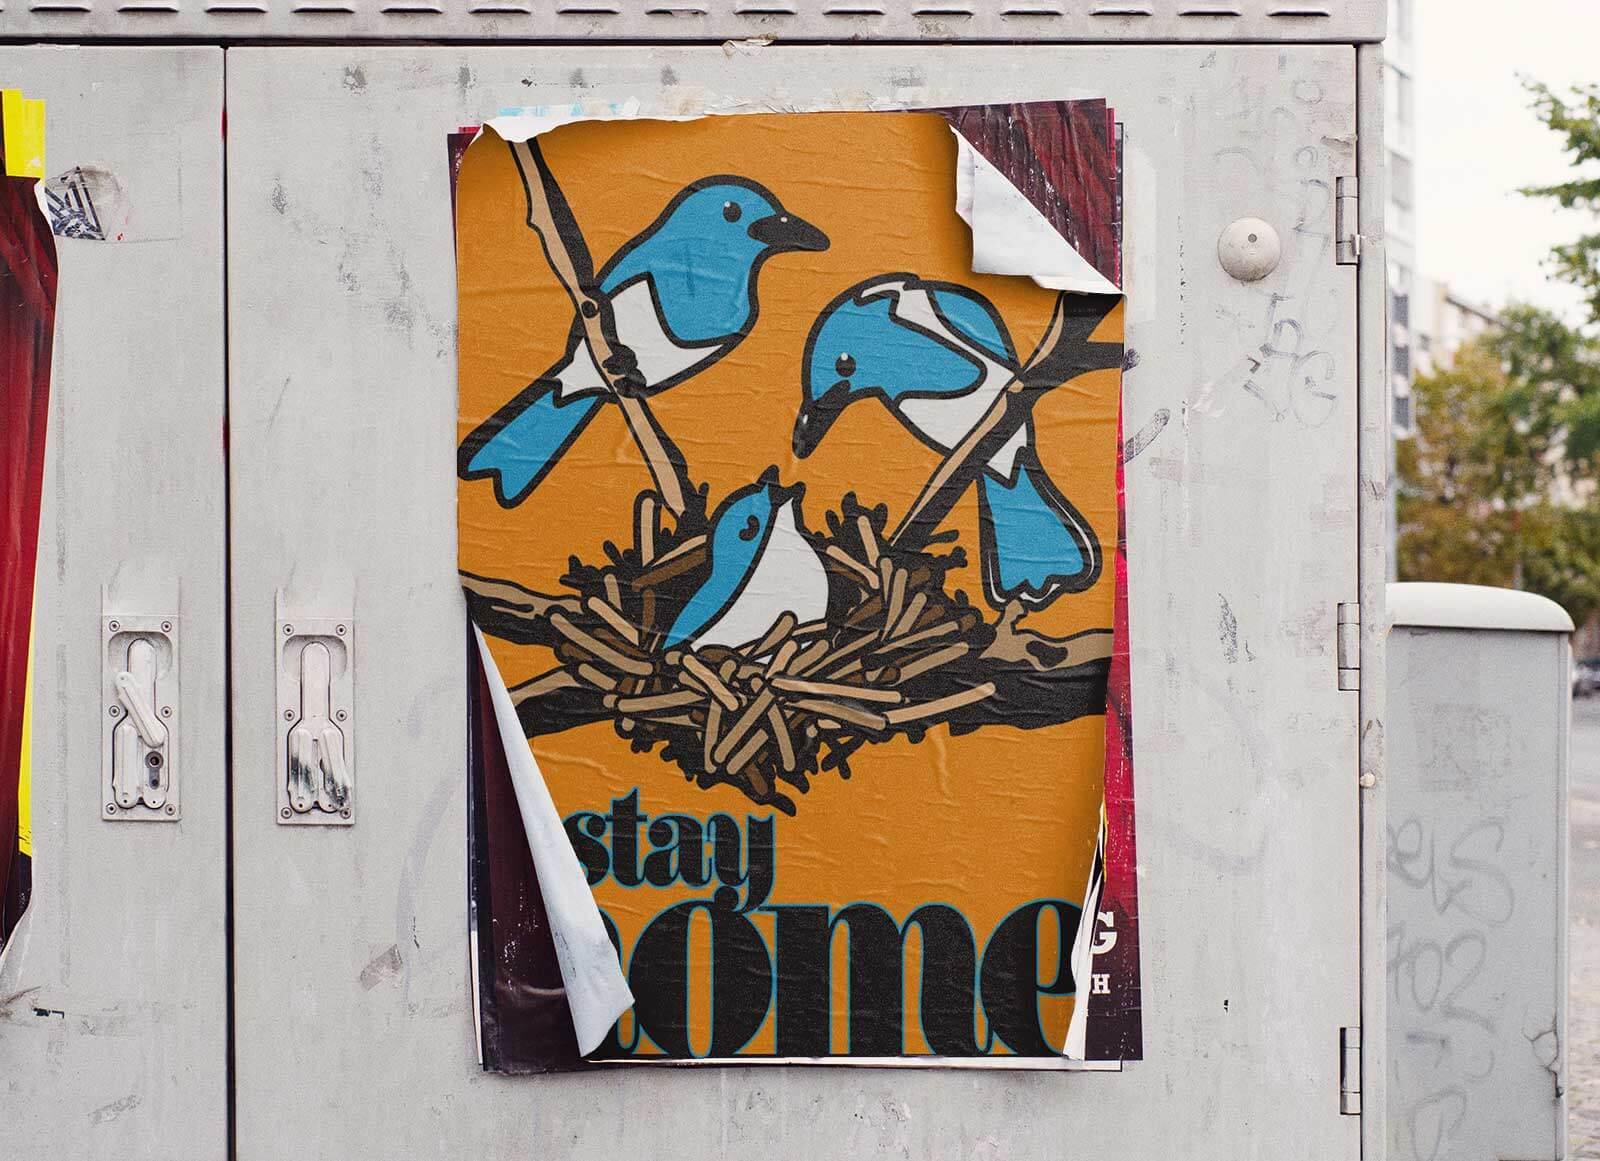 Free-Photorealistic-Street-Poster-Mockup-PSD